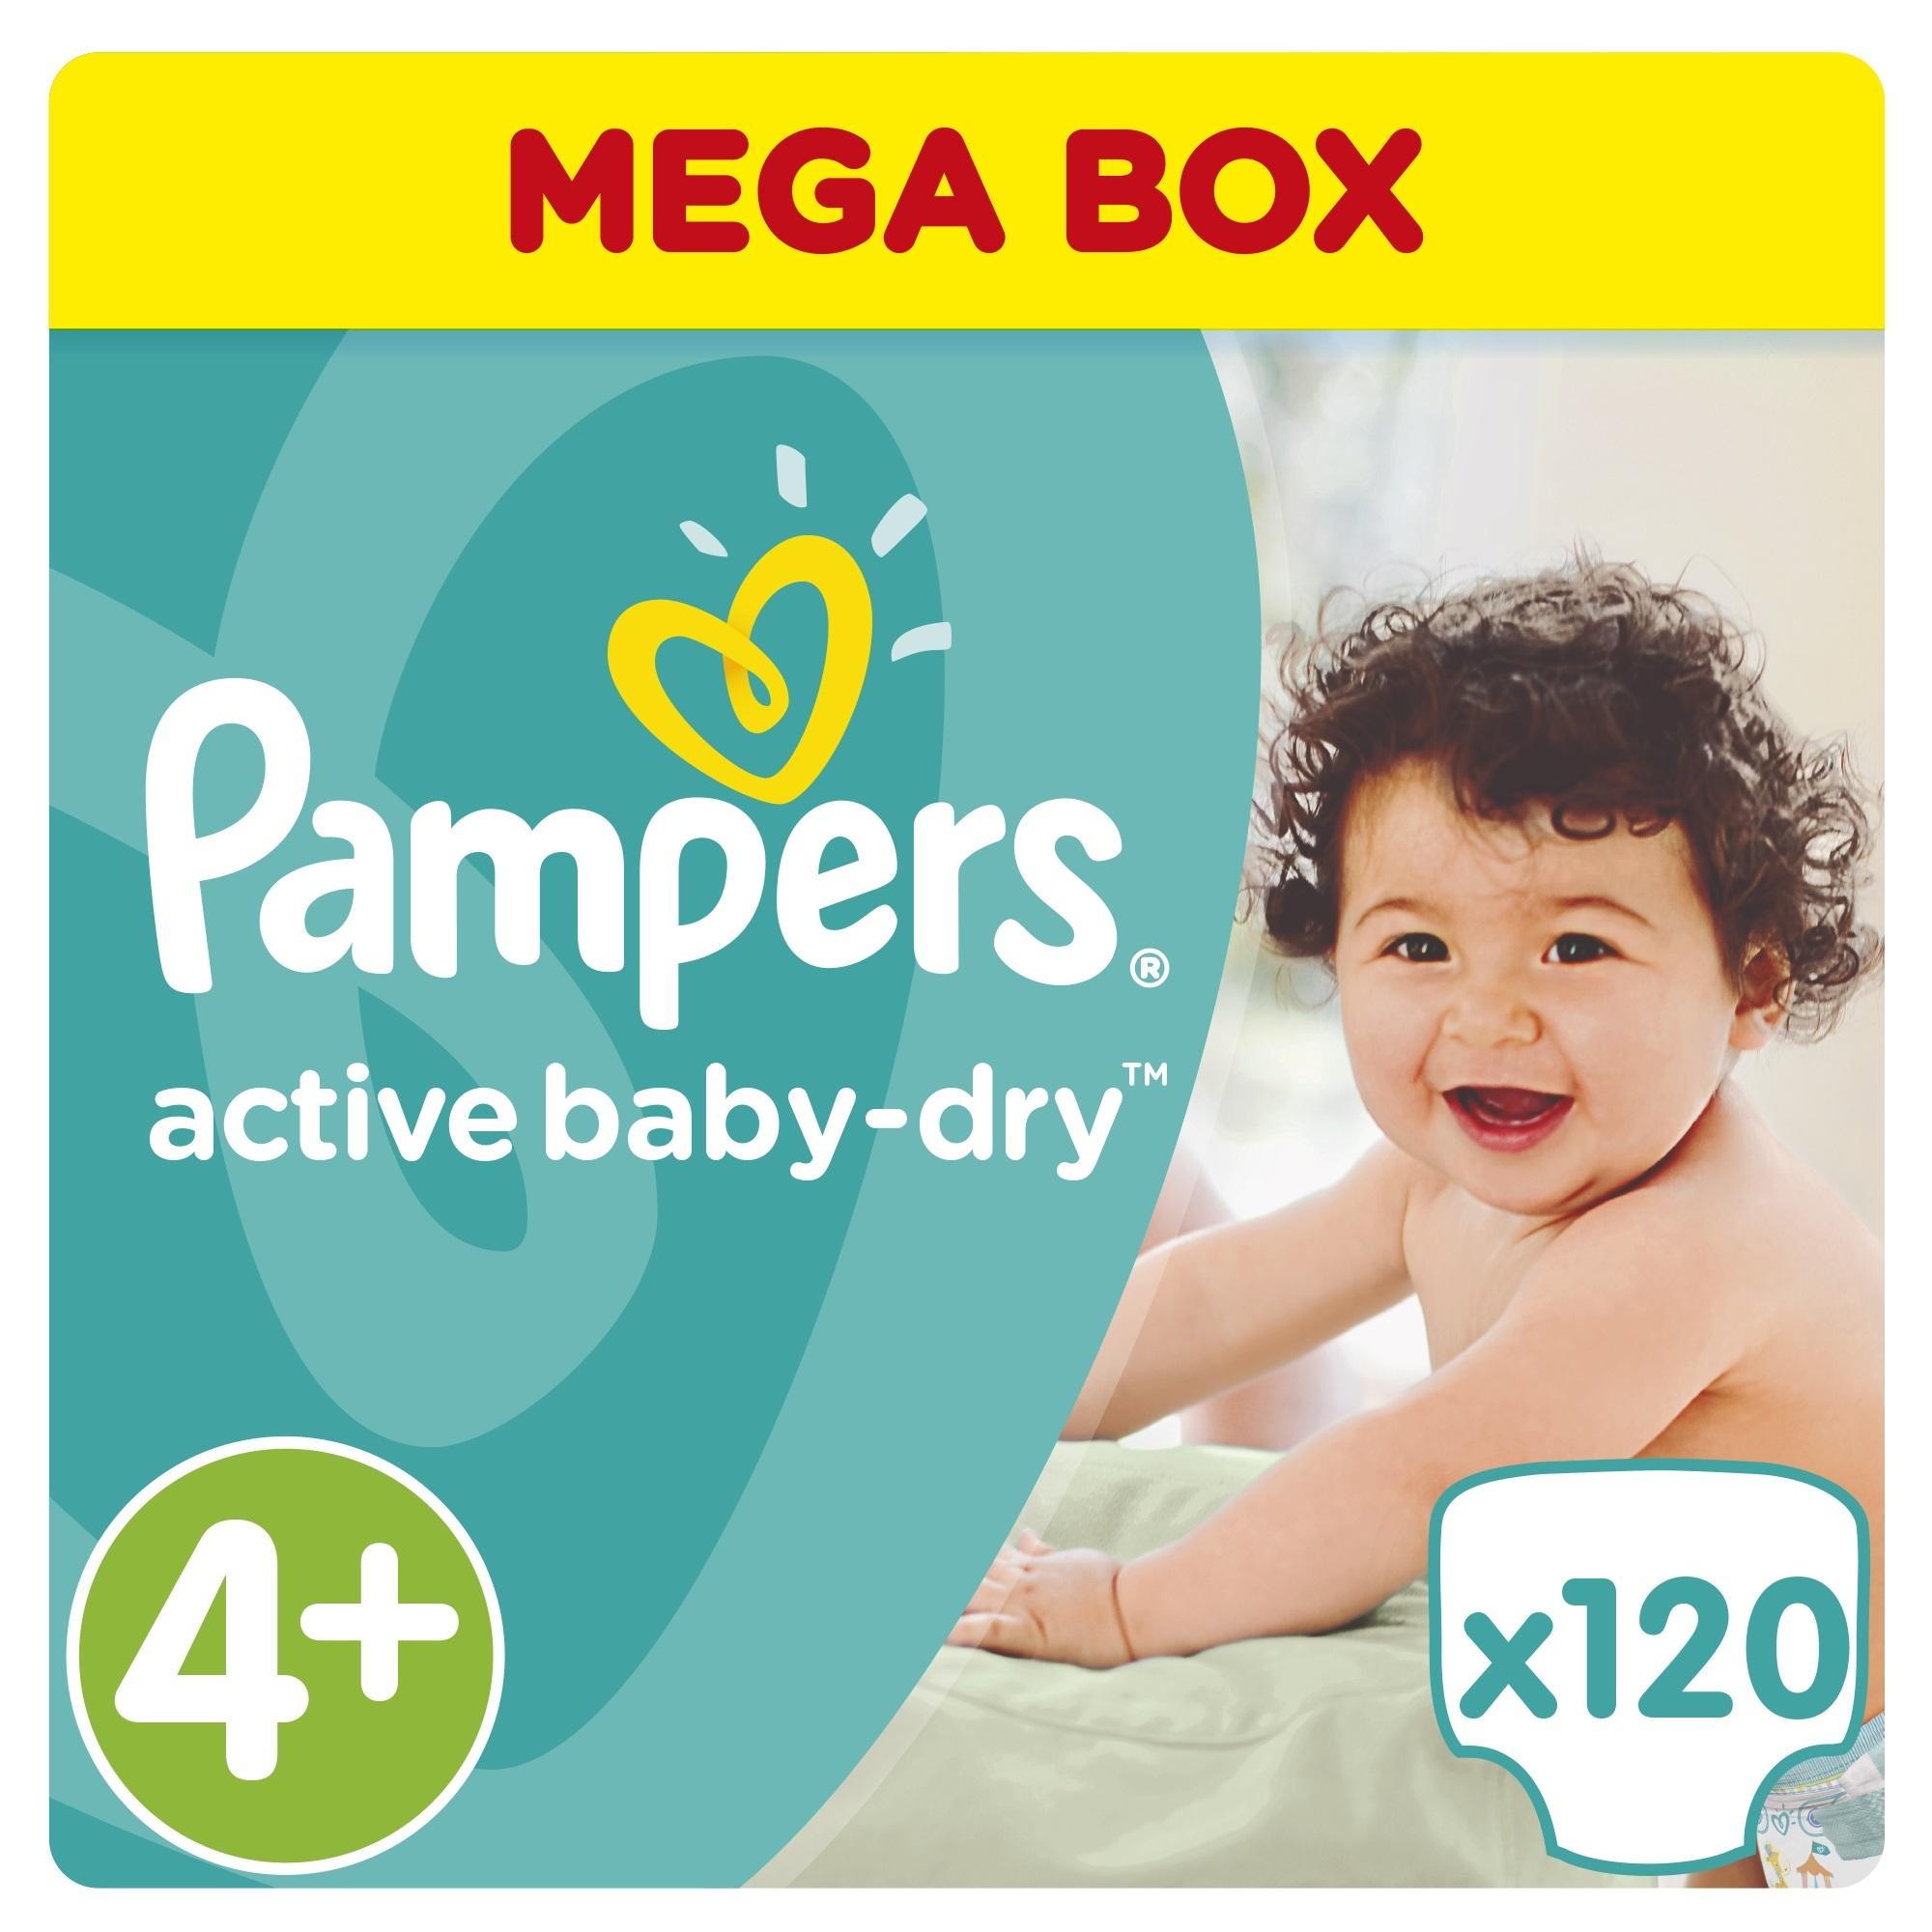 198e29148b3 7 απαραίτητα πράγματα που πρέπει να έχει η σωστή πάνα του μωρού -  boxpharmacy.gr